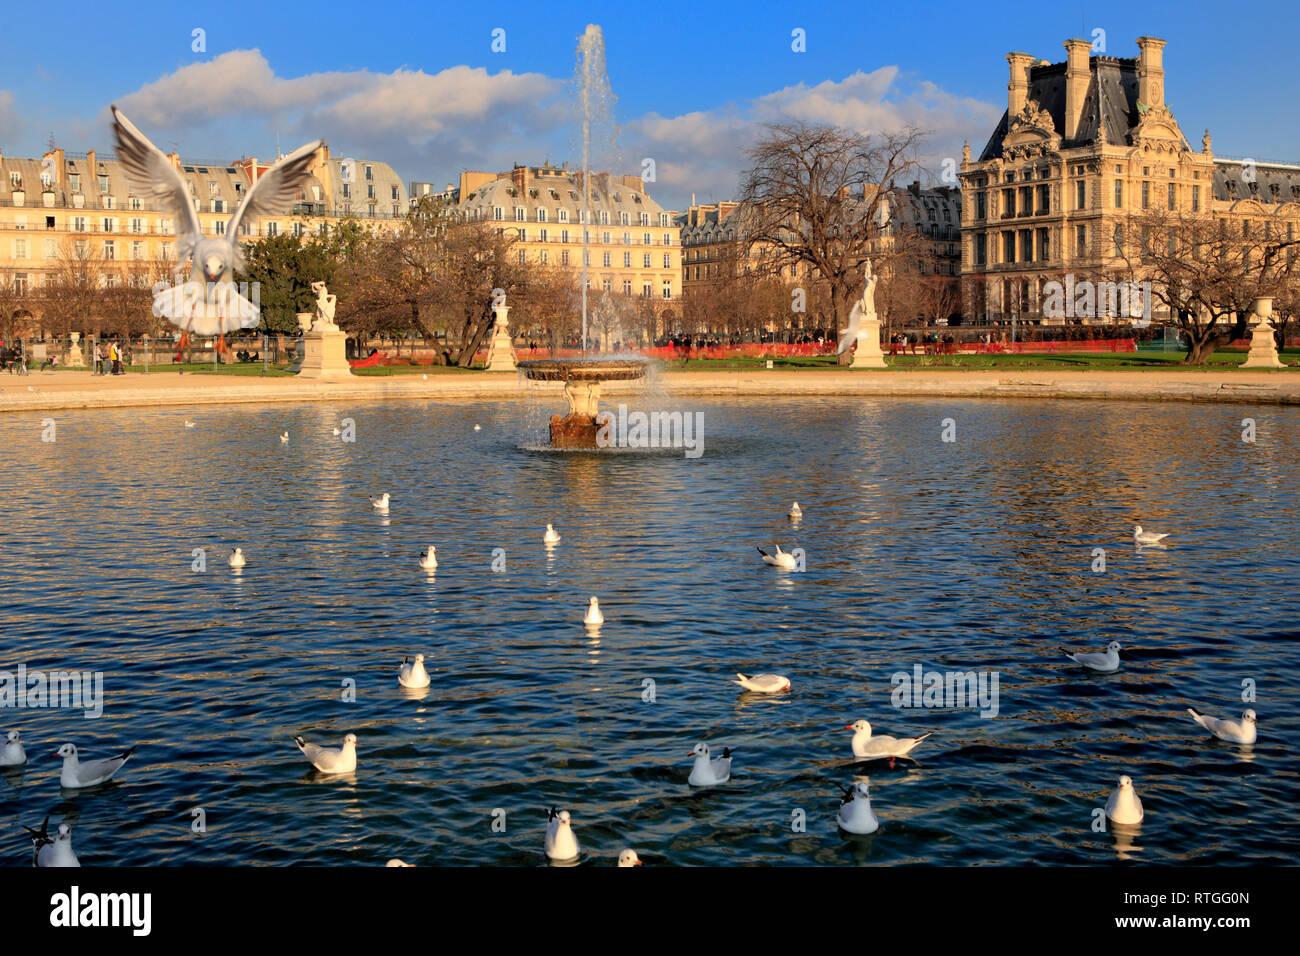 Grand Bassin Octagonal, Tuileries Garden, Paris, France - Stock Image